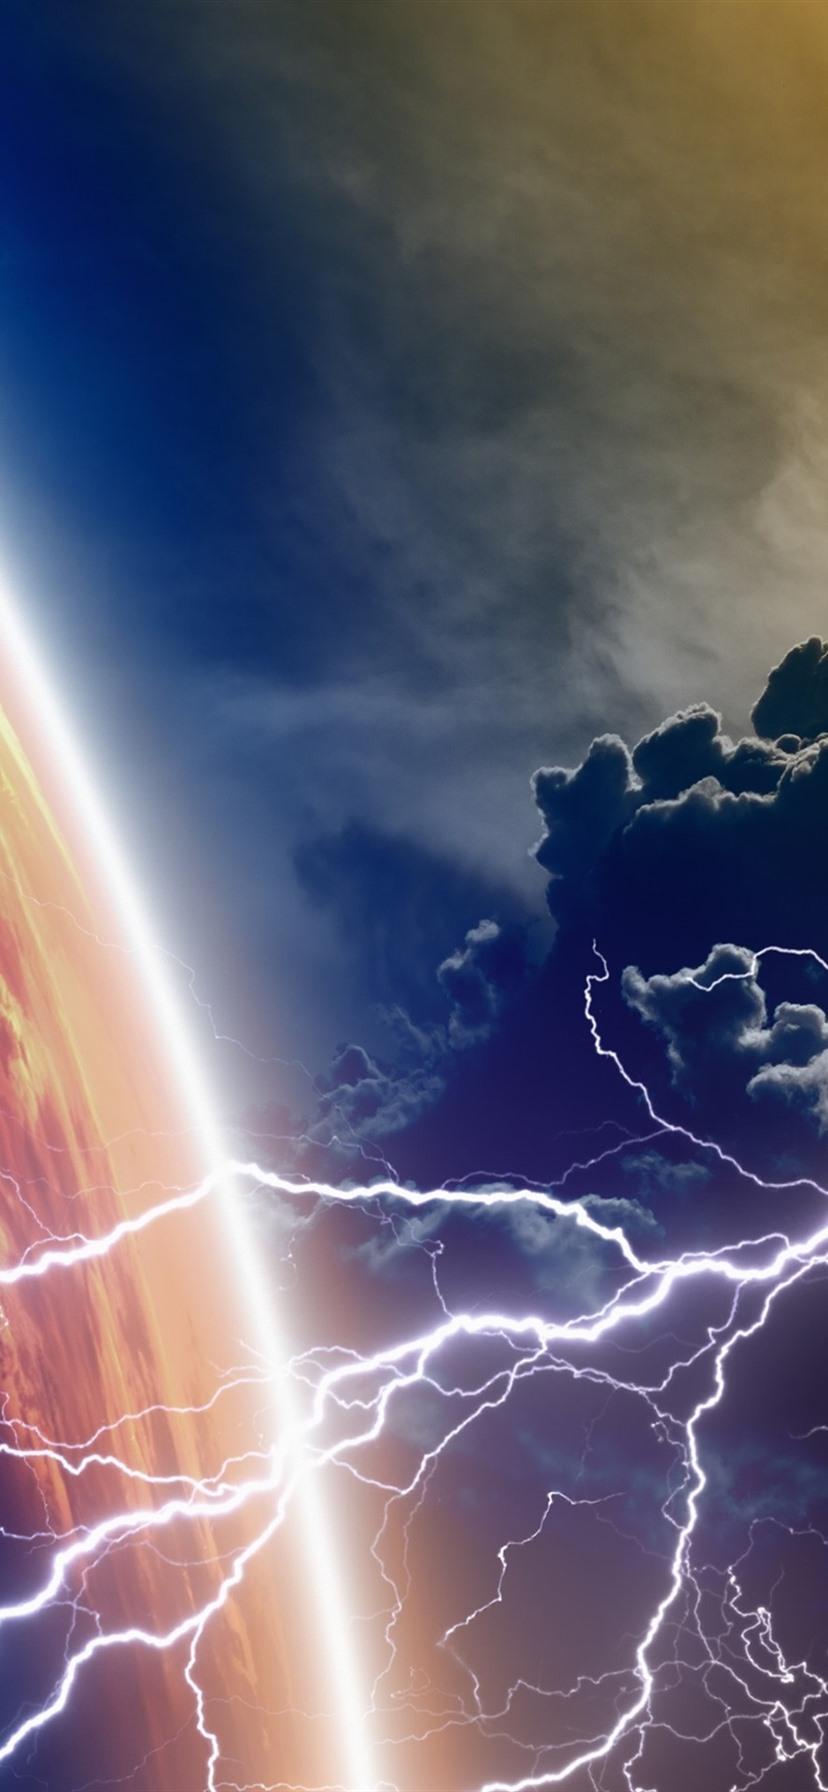 Wallpaper planet clouds lightning 3840x2160 uhd 4k - 4k girl wallpaper for iphone ...